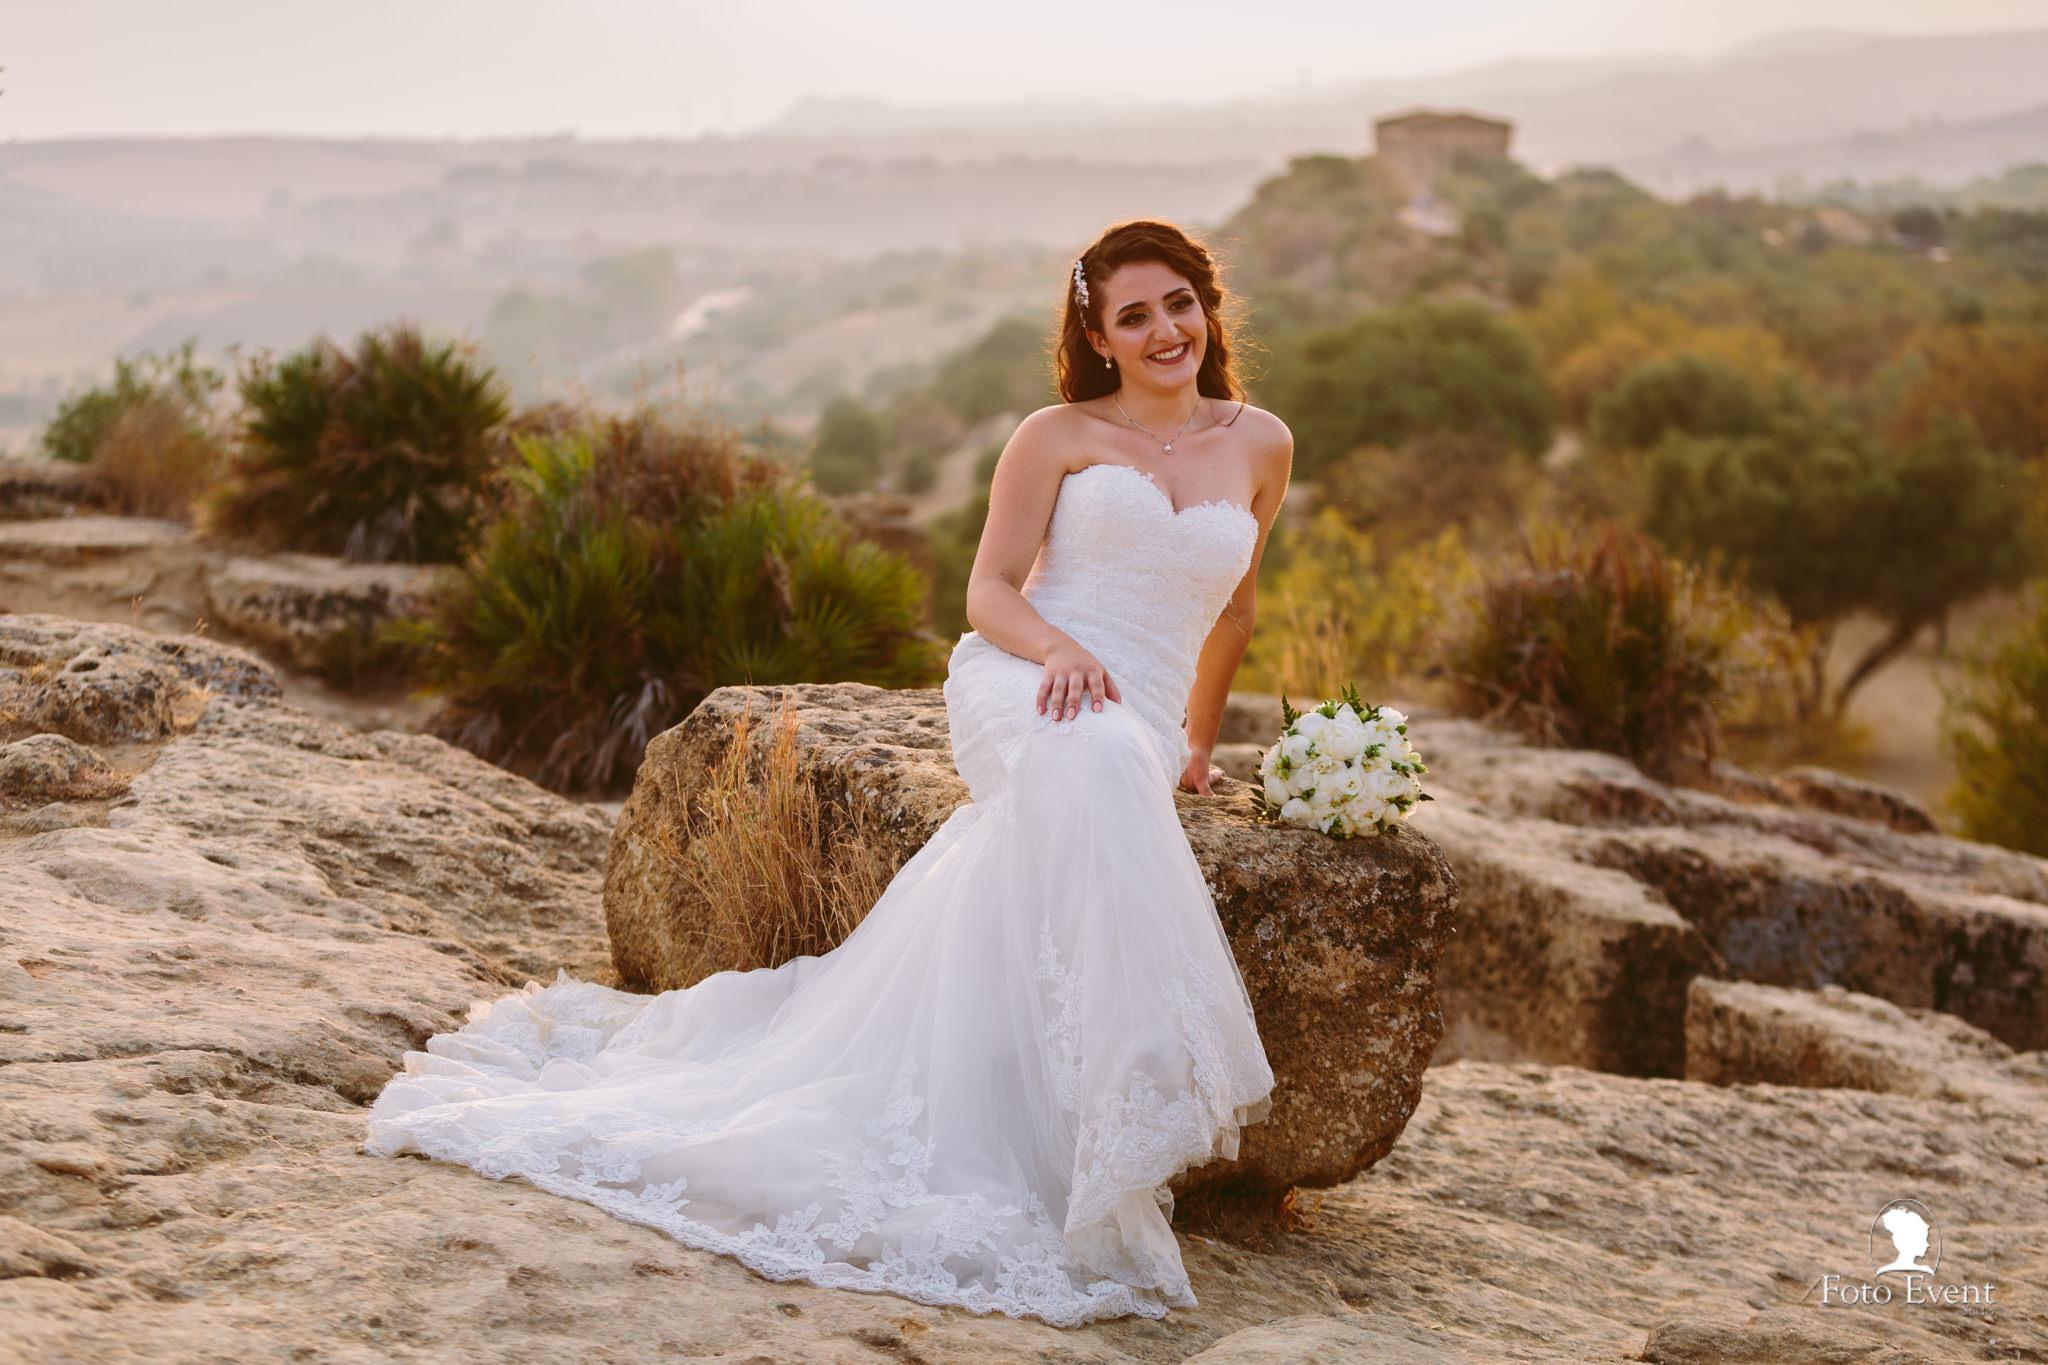 043-2019-08-31-Matrimonio-Serena-e-Saverio-Tarantino-zoom-435